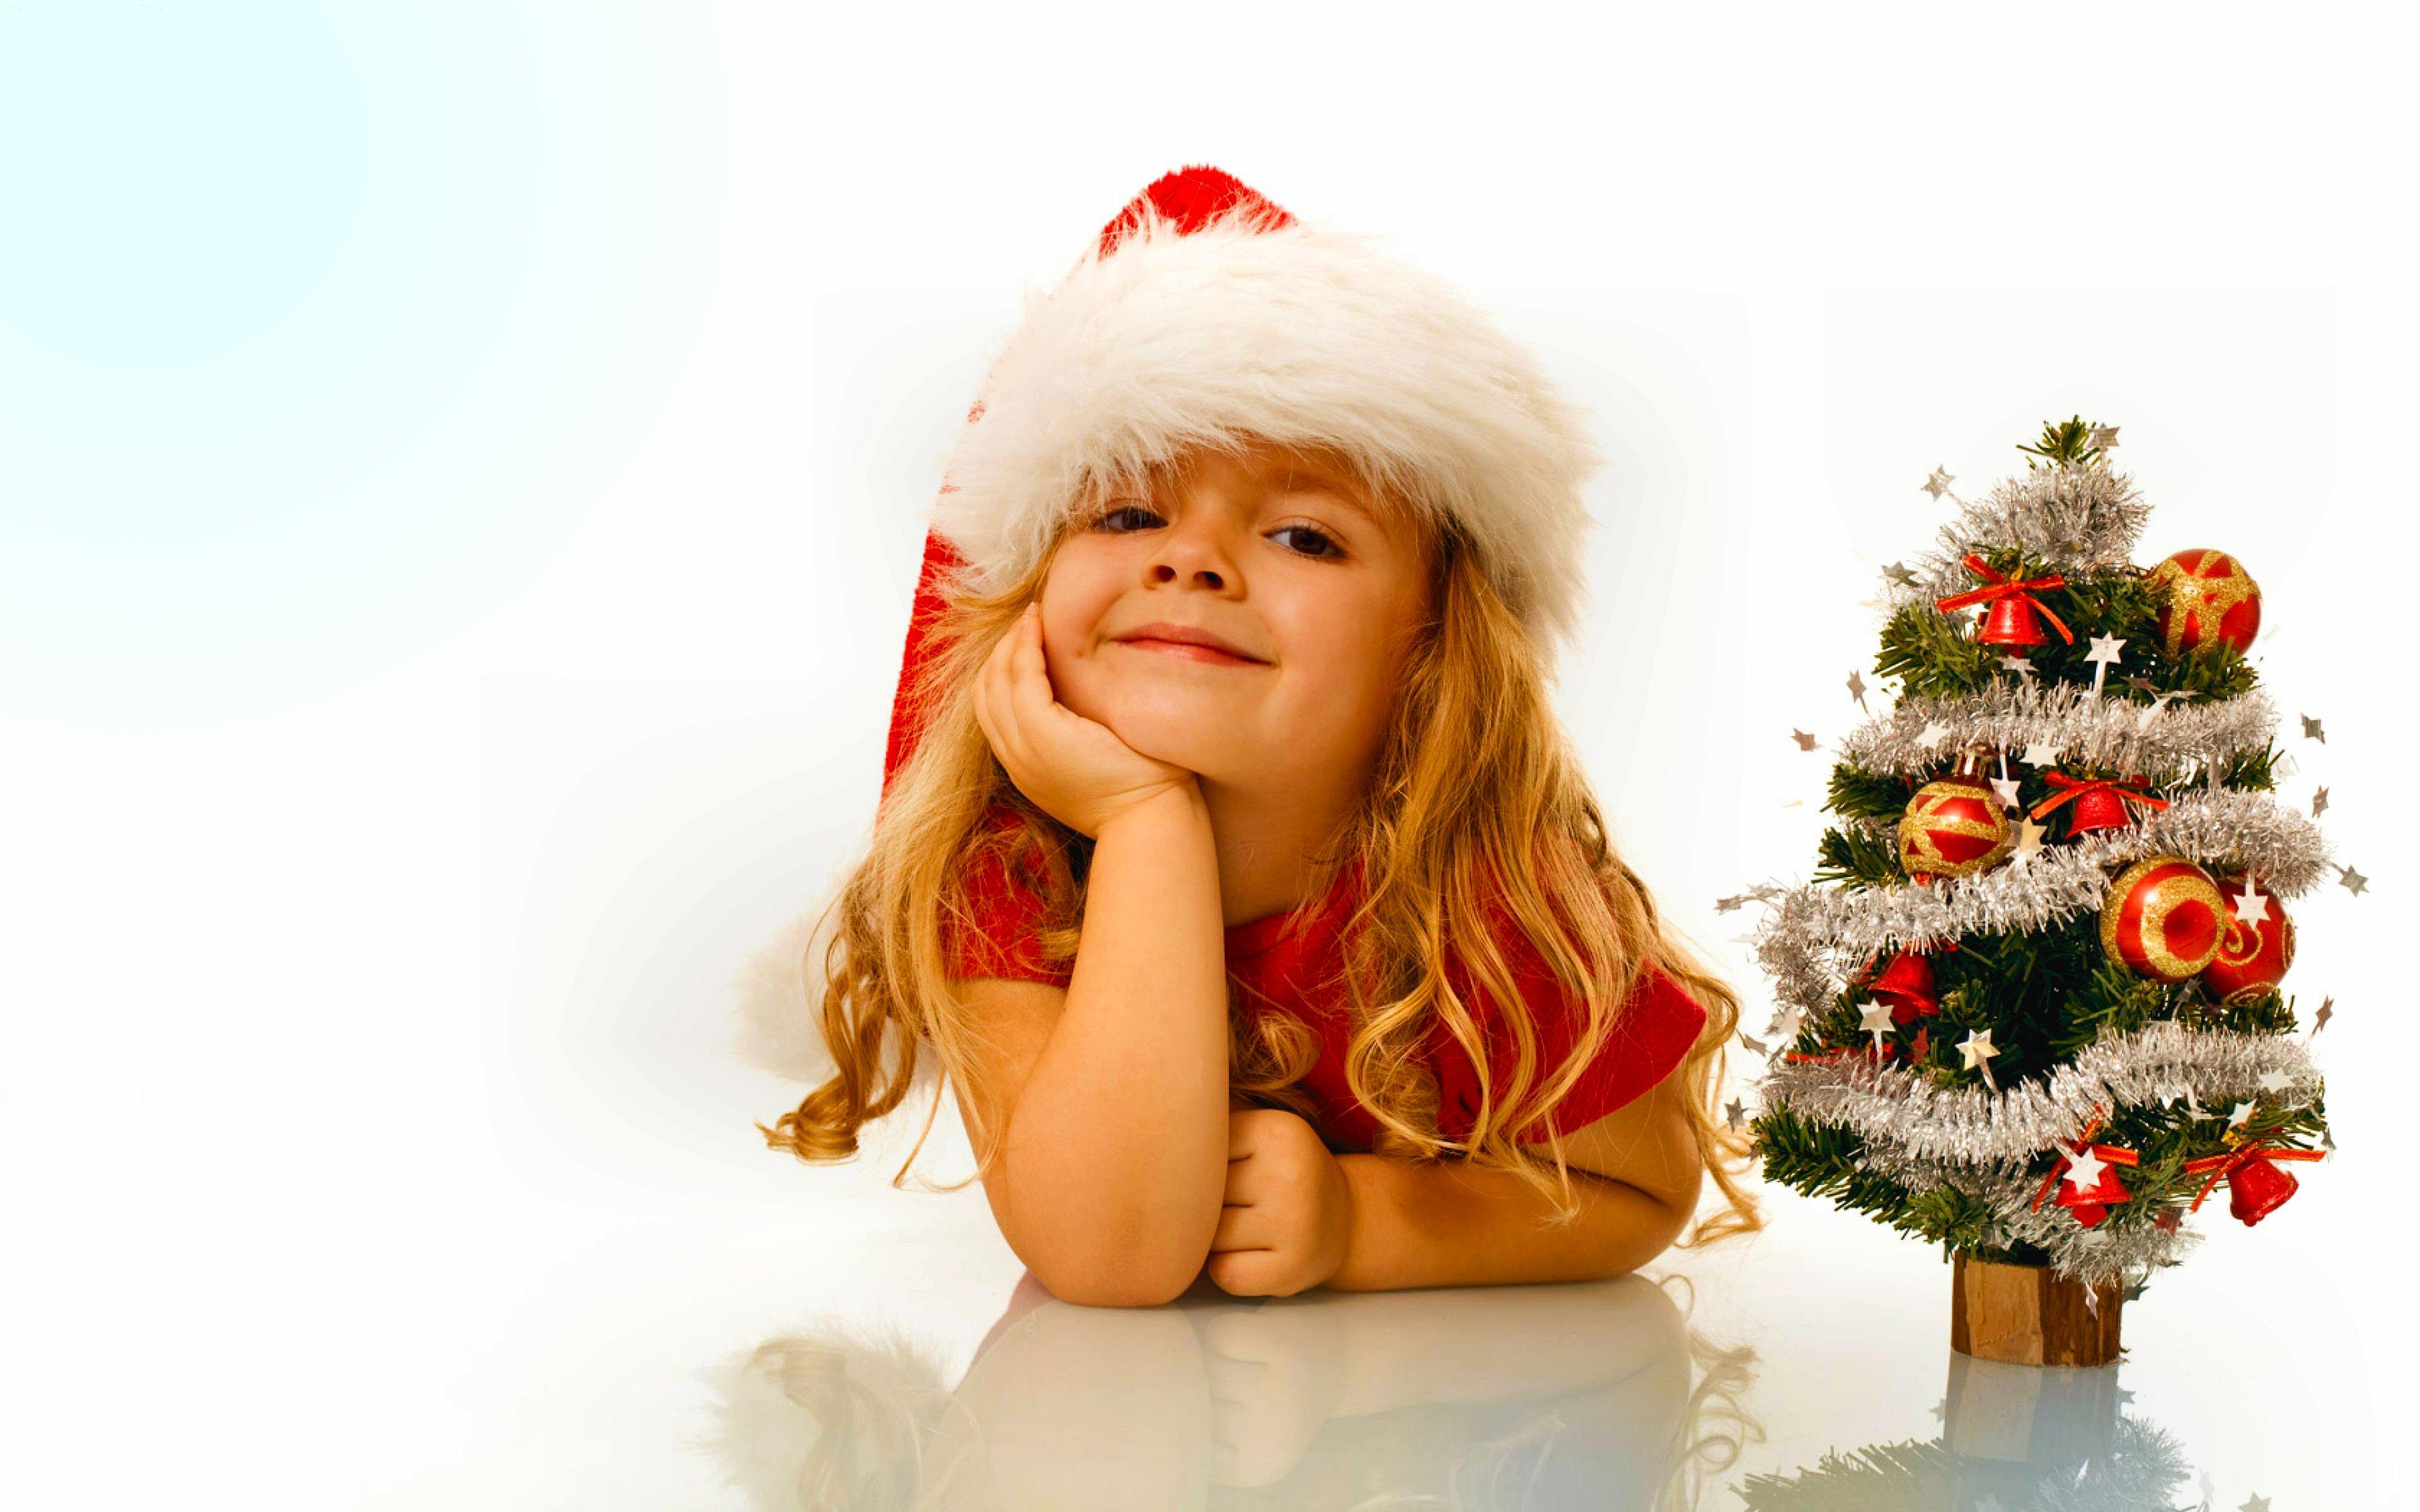 Cute Girl Wallpaper Santa Banta Christmas 11 Cute Santa 03december2014wednesday